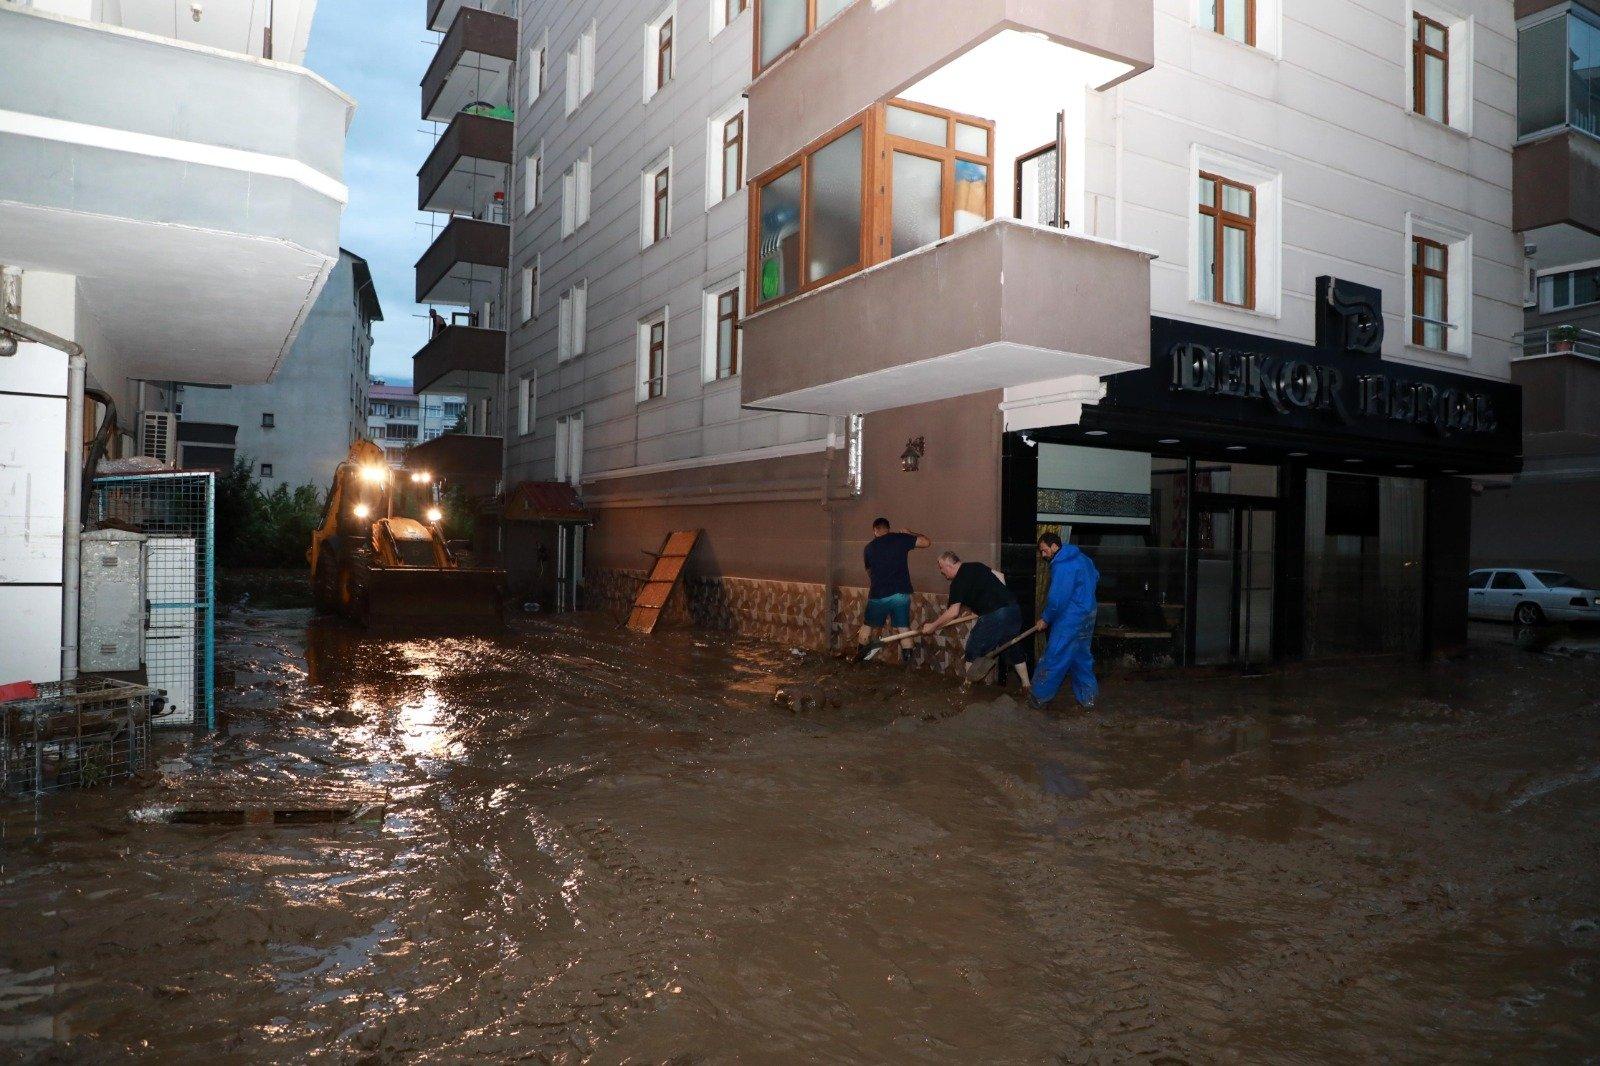 Artvin's Arhavi district is flooded due to heavy rainfall, Turkey, July 22, 2021. (AA Photo)